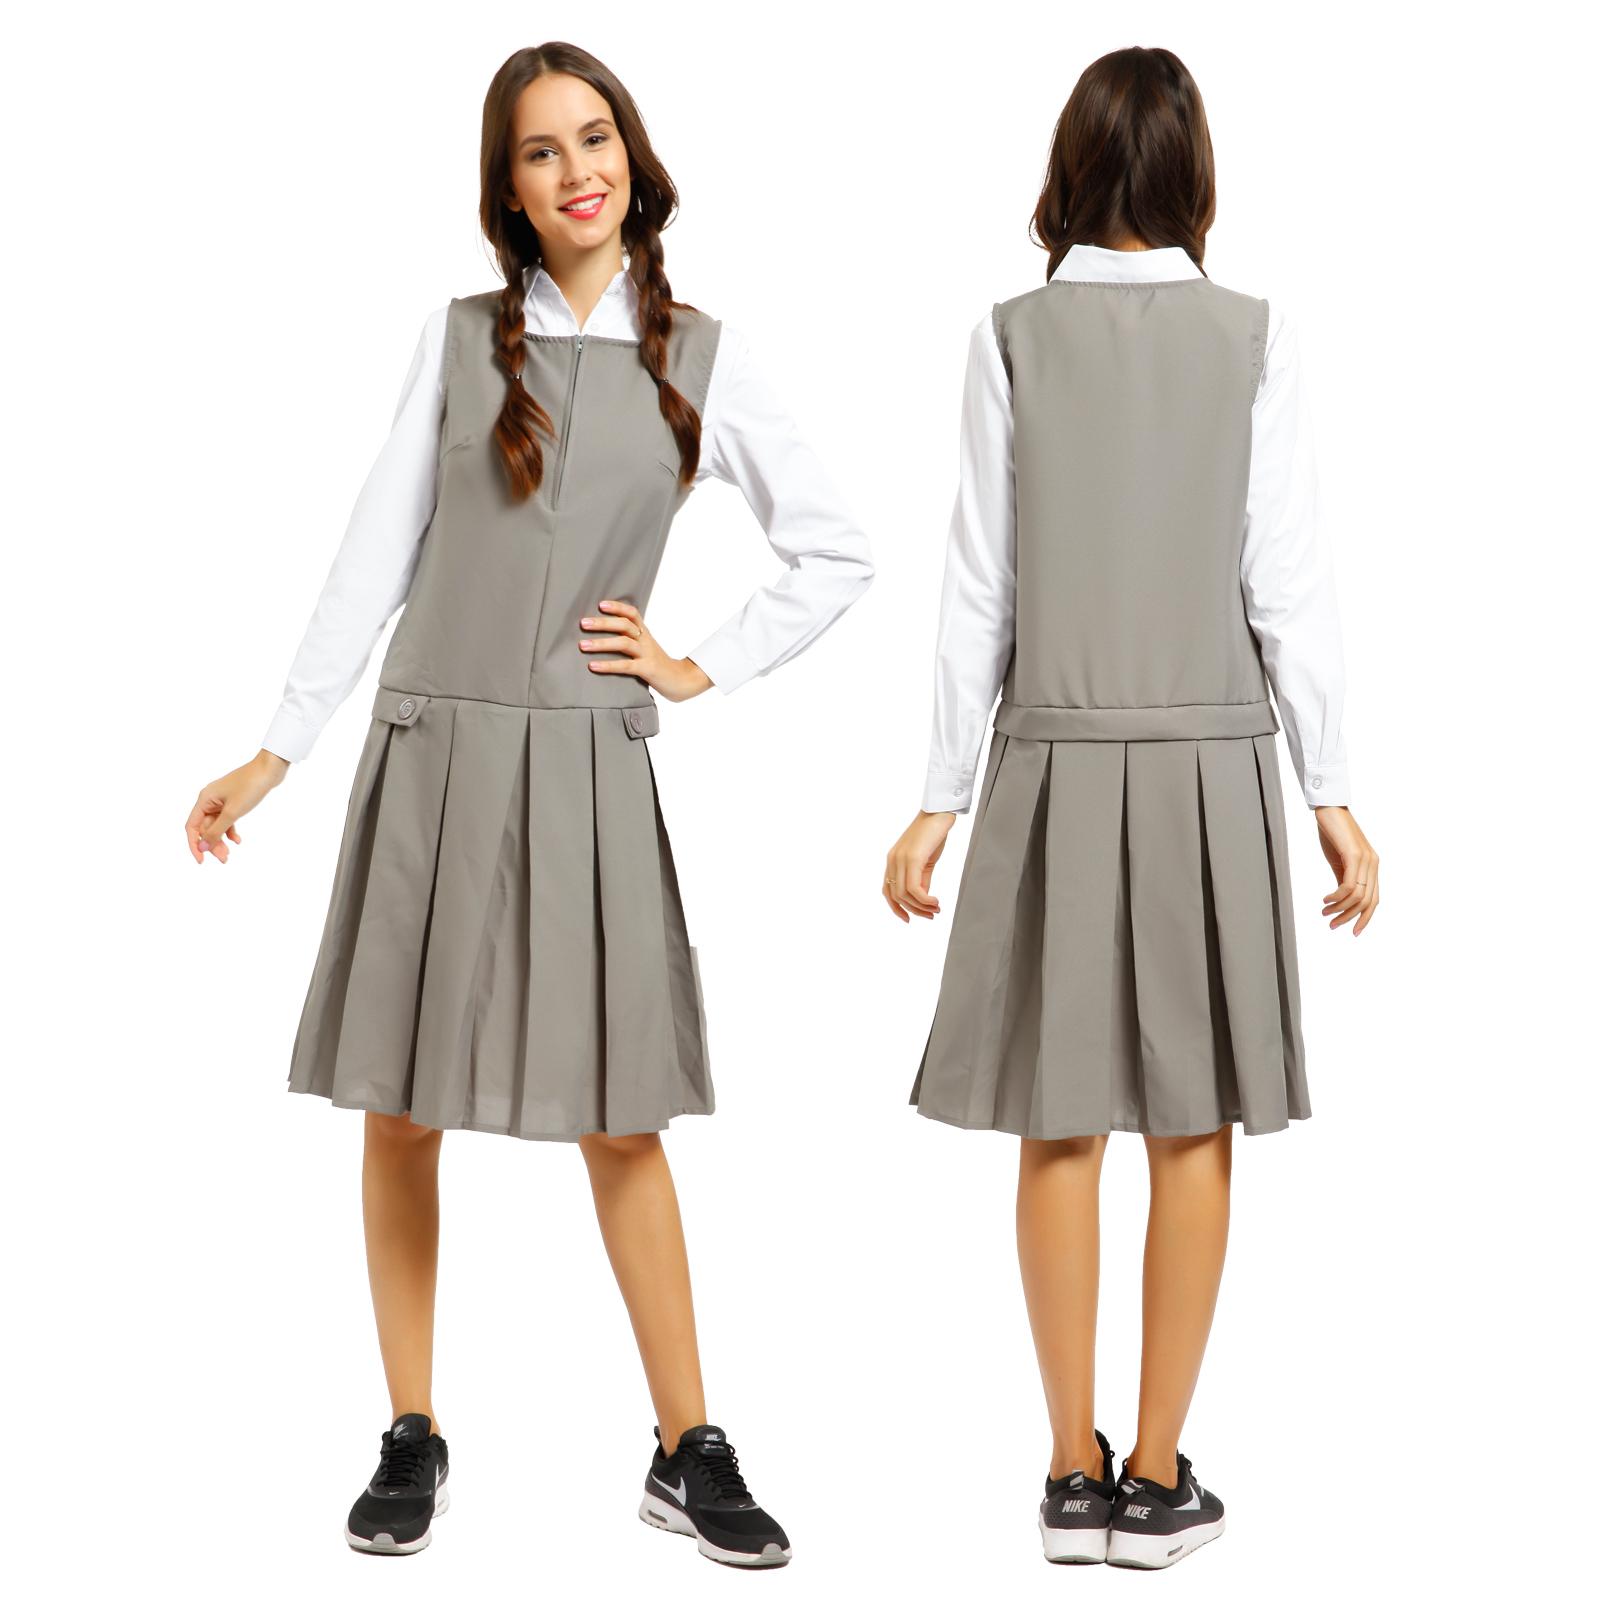 3bef4a2fa2 Girls School Uniform School Wear Sleeveless Zip Front Pleated Pinafore Dress  | eBay